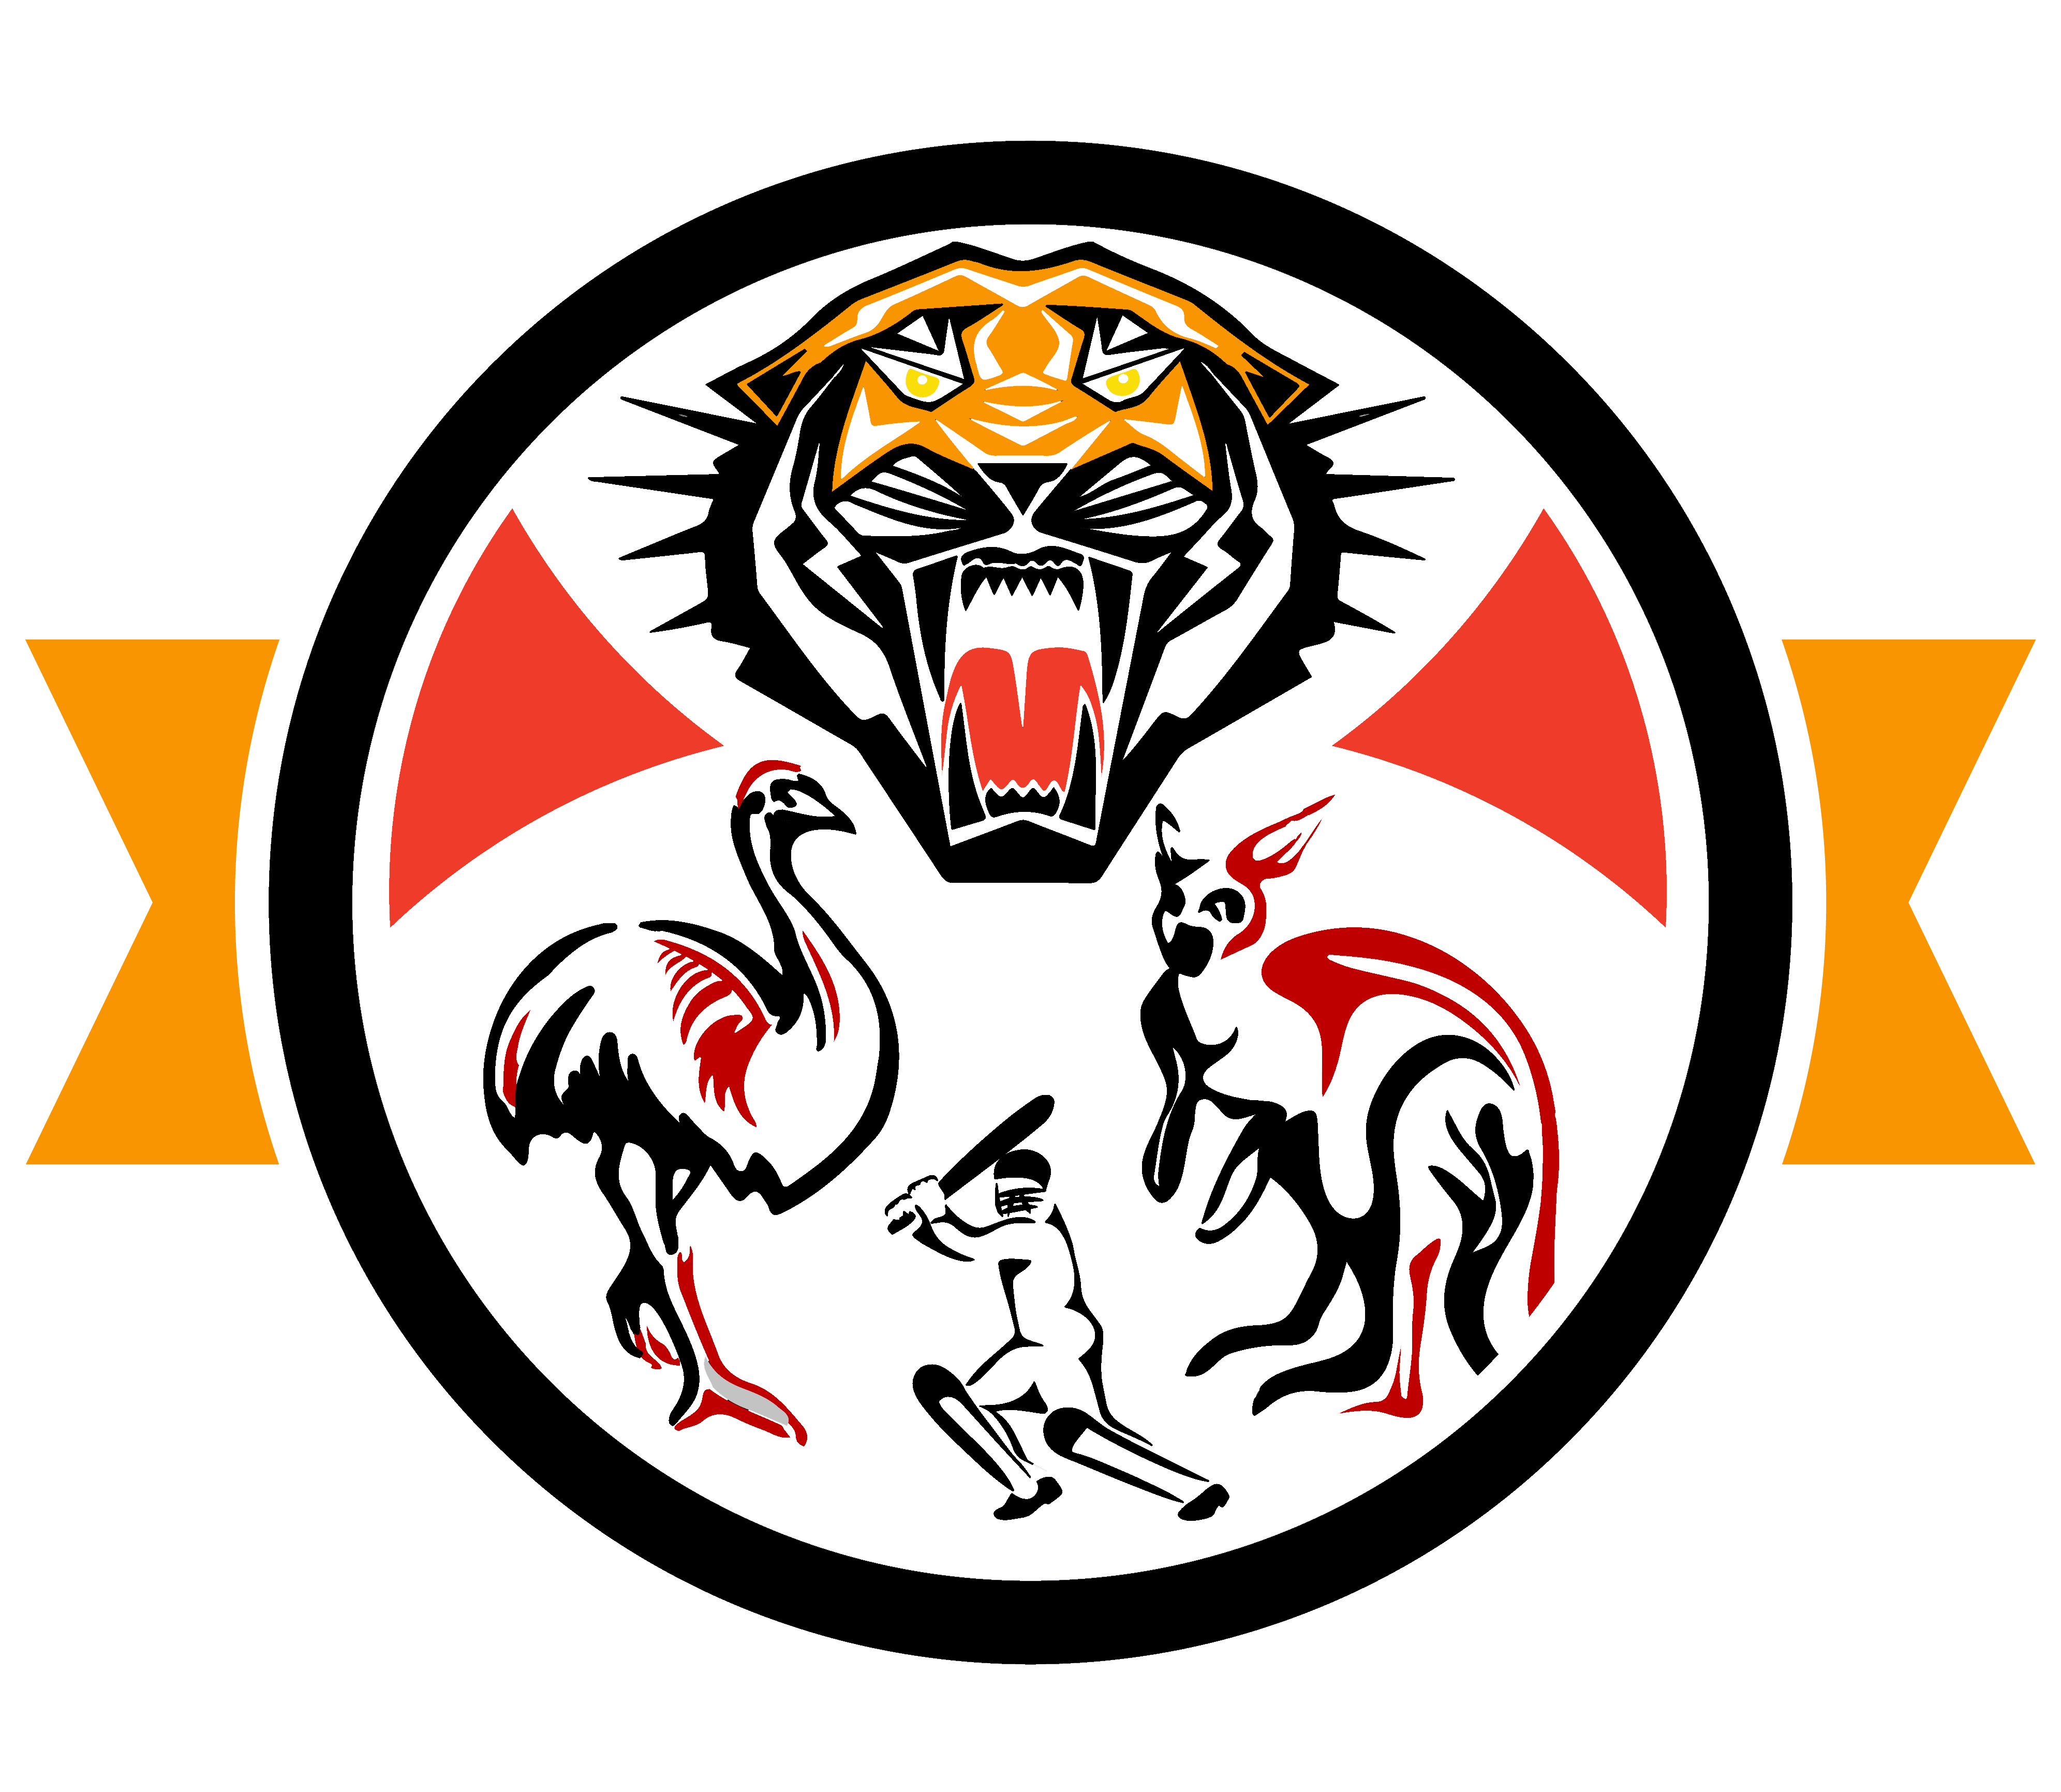 Brisbane Cool Boys (Tamilanda) Team Profile - Play Cricket!